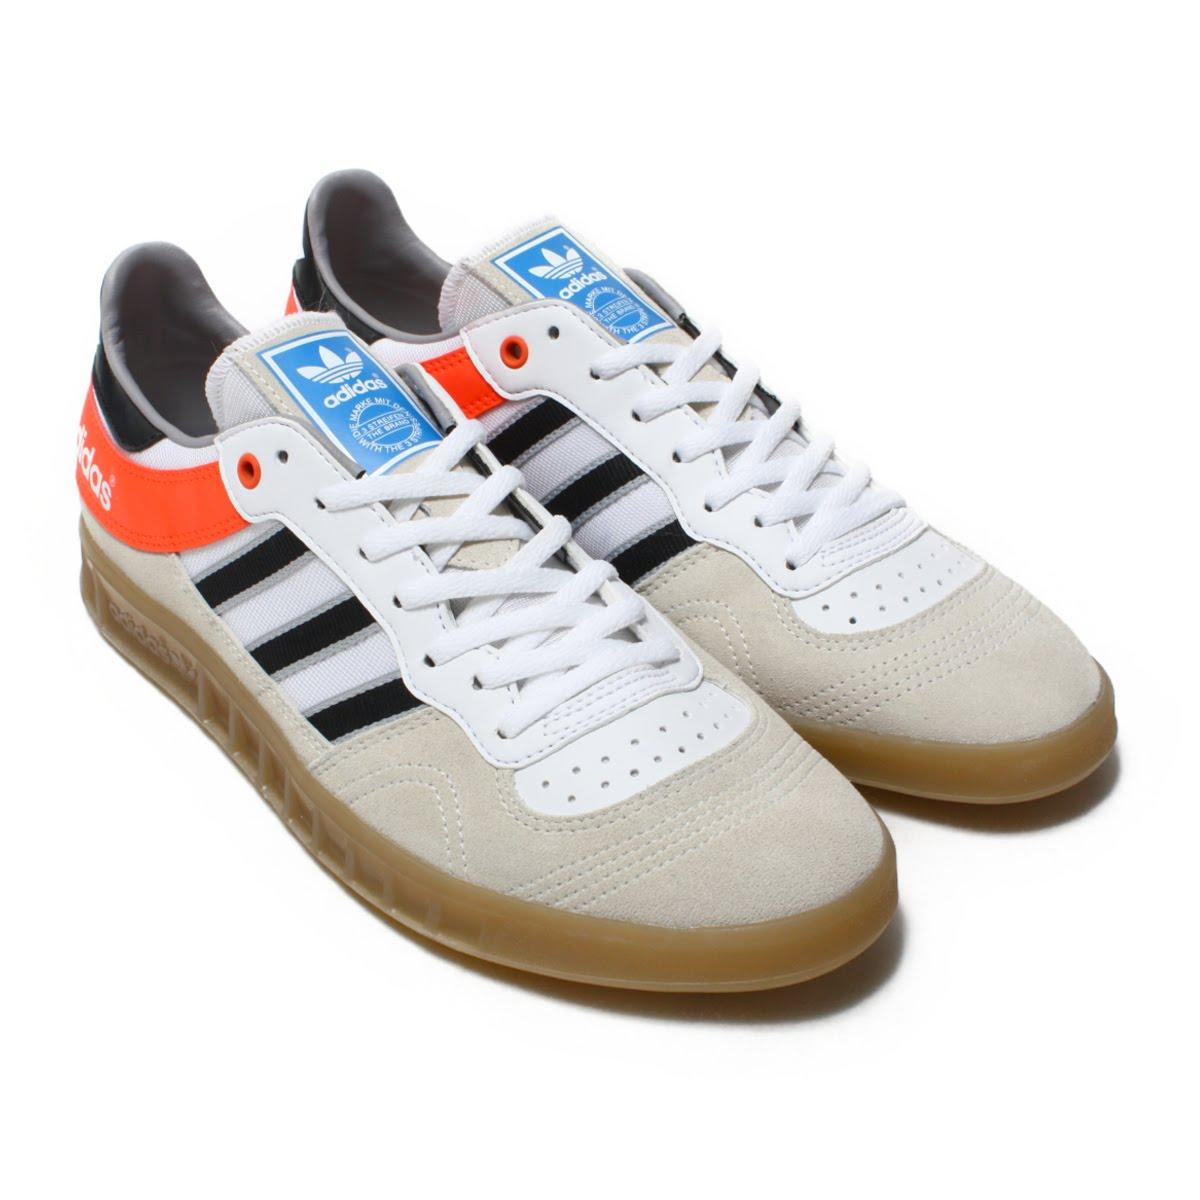 cc9a50f1b72f31 adidas Handball Top (the Adidas handball top) chalk white   core black    solar red 18FW-I